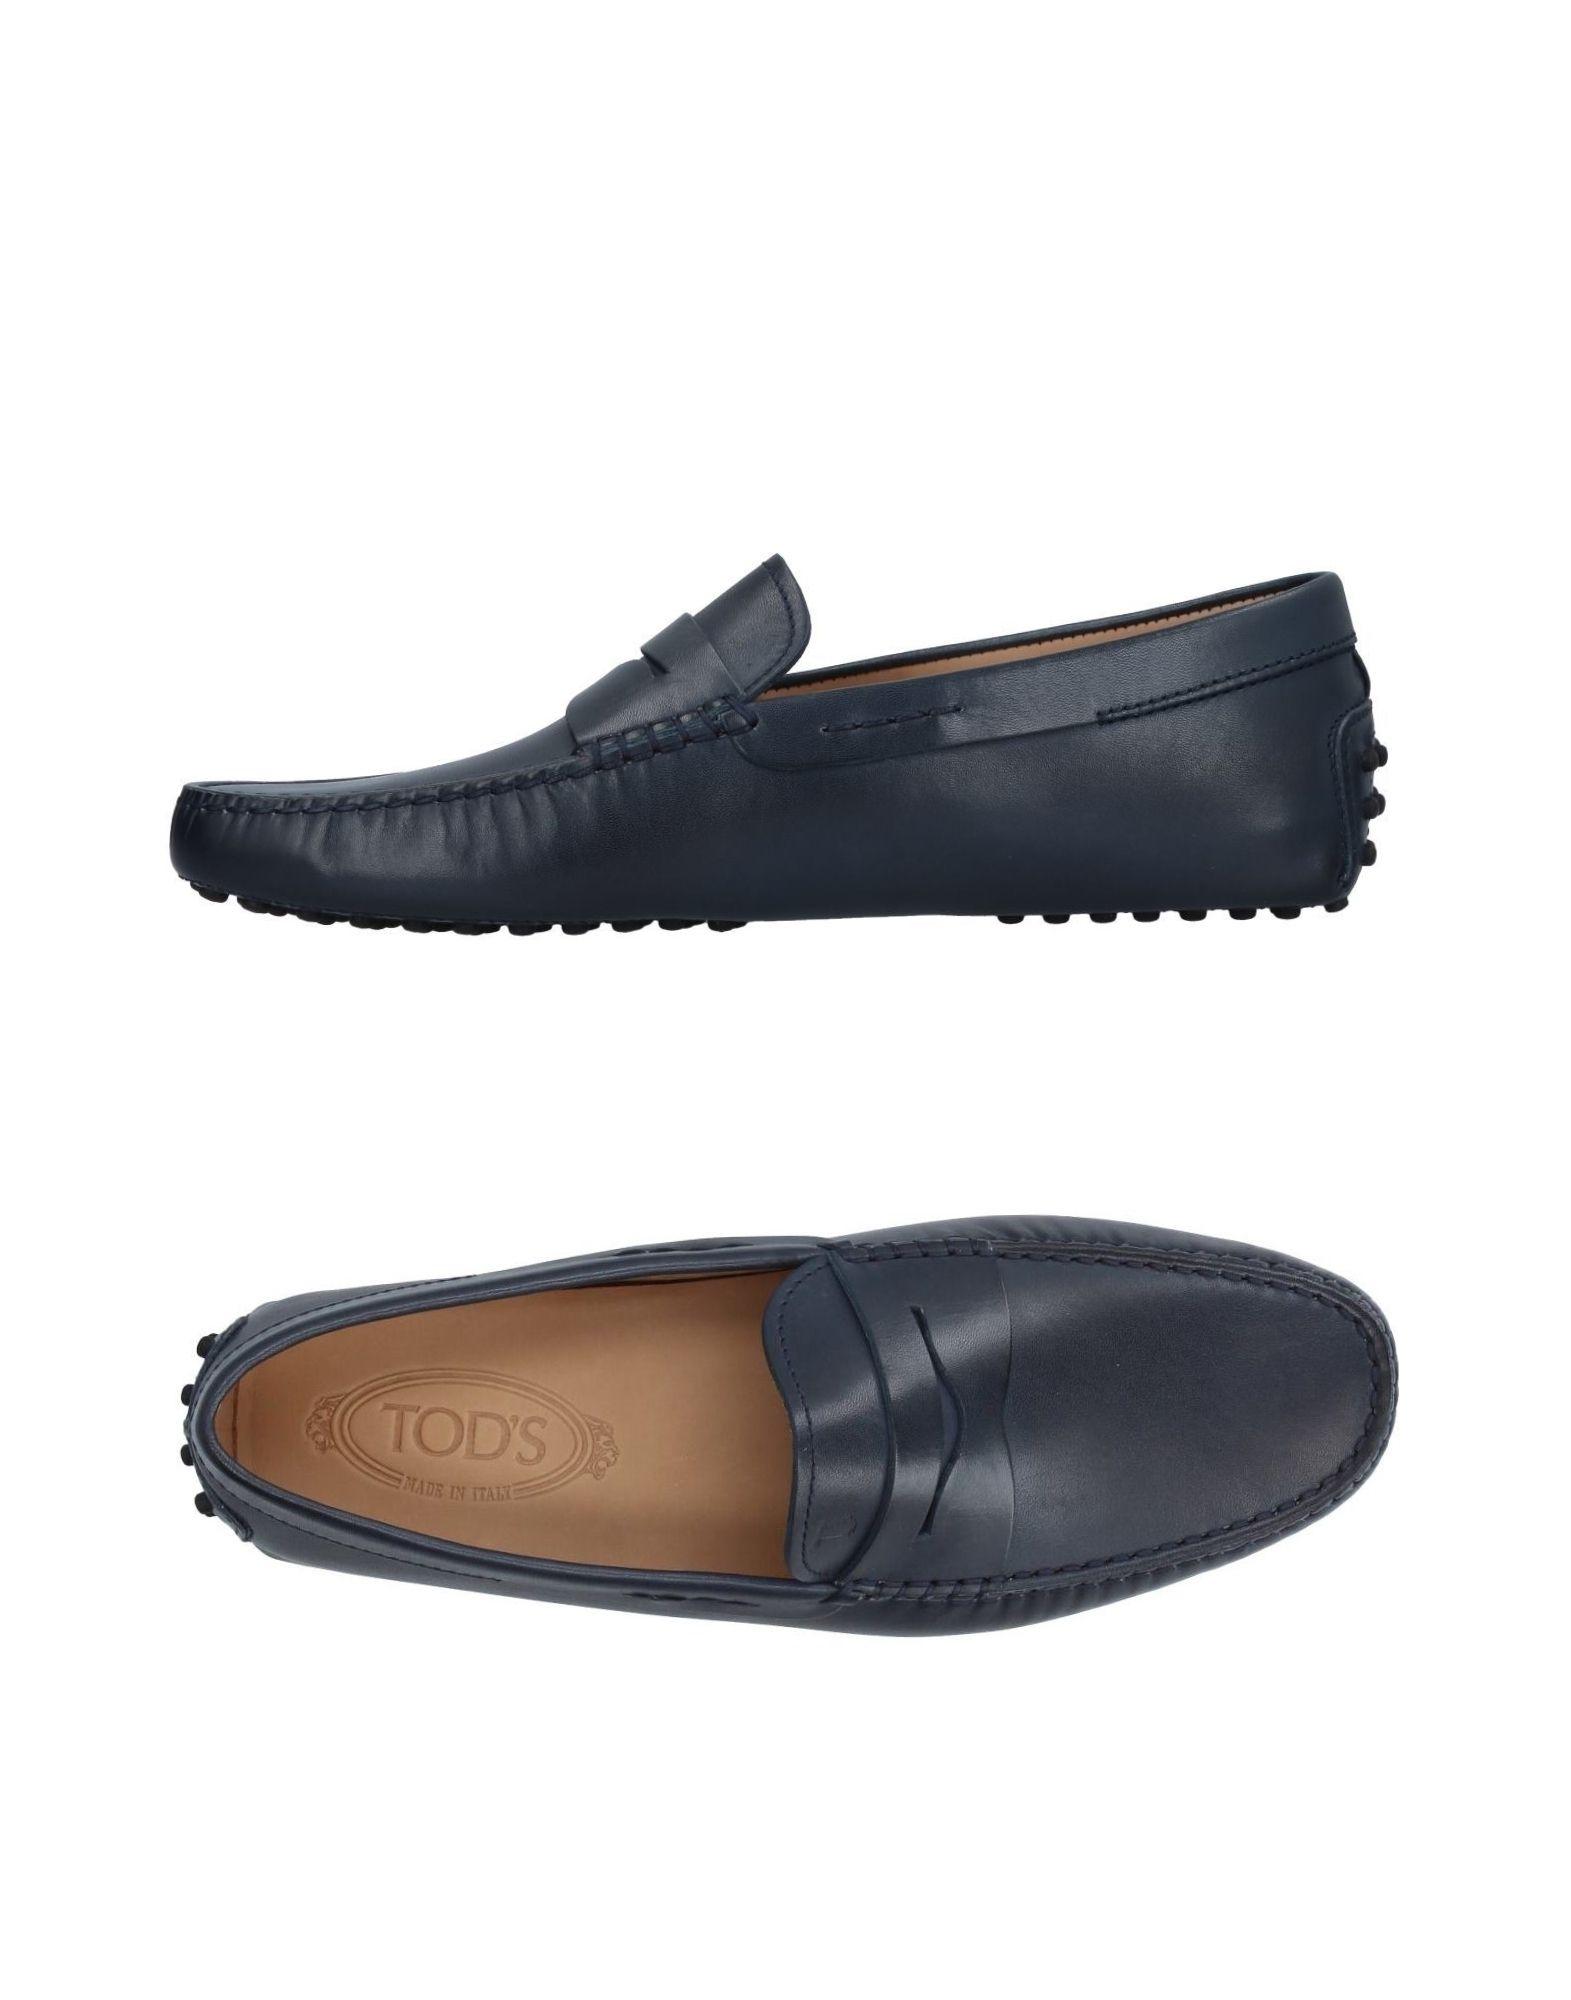 Tod's Mokassins Herren  11157713DD Gute Qualität beliebte Schuhe